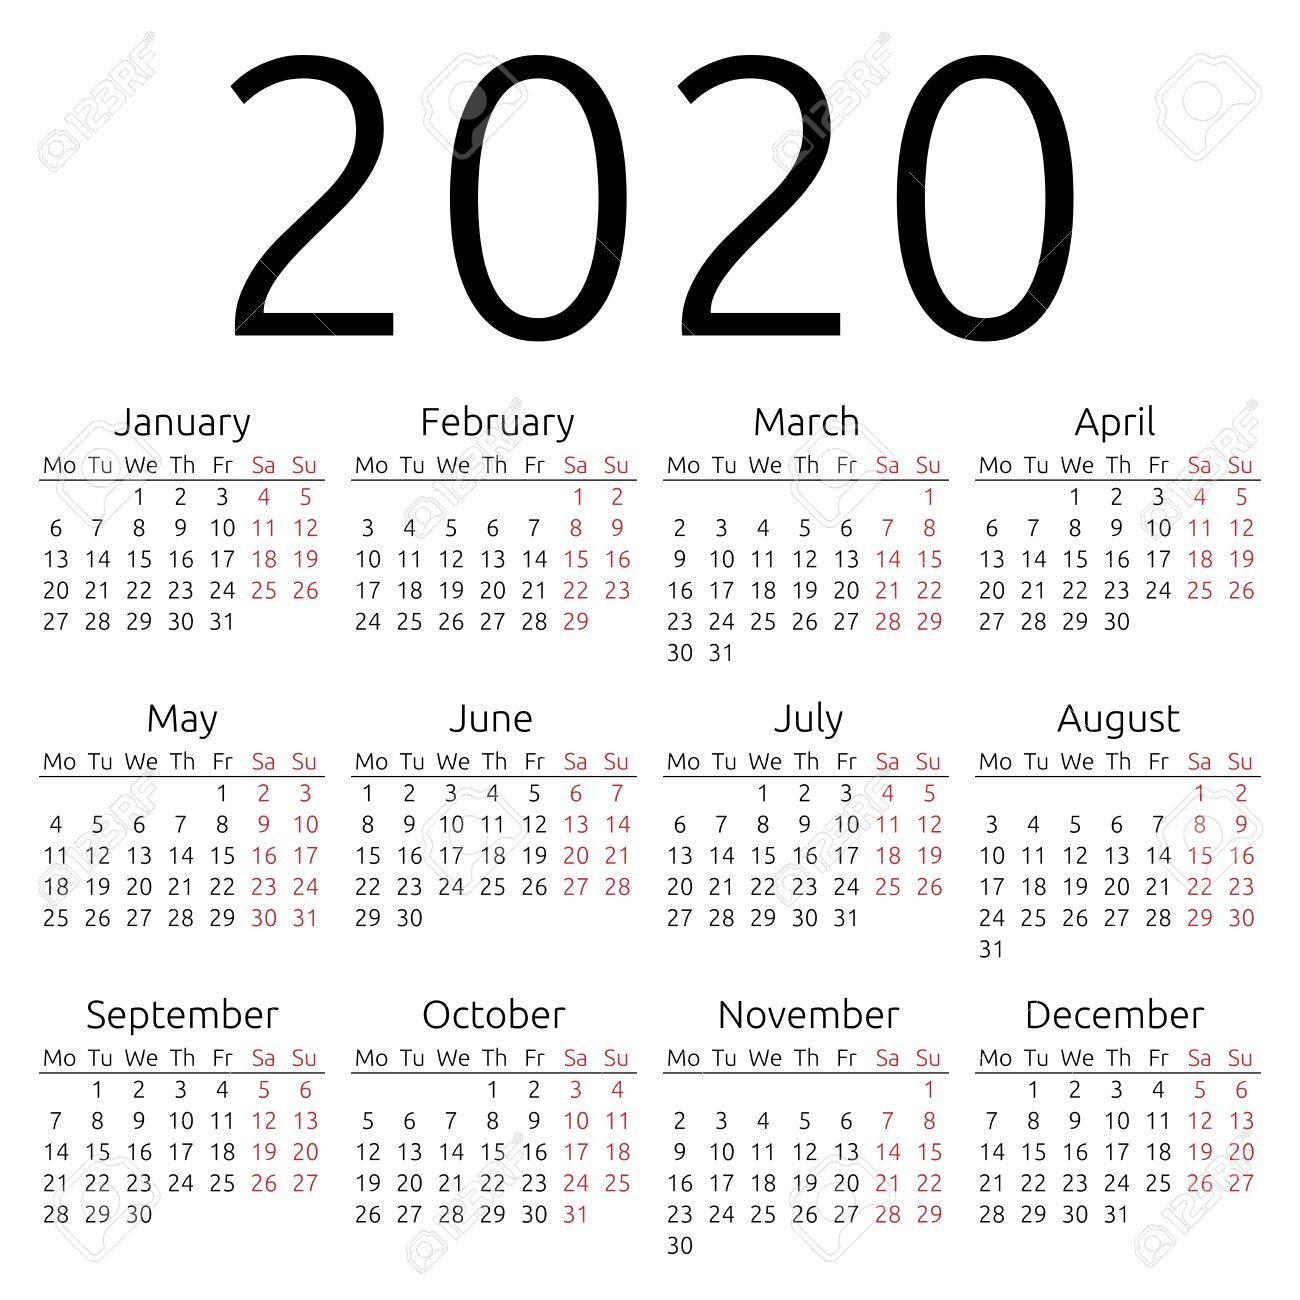 Simple 2020 year calendar - 38478895